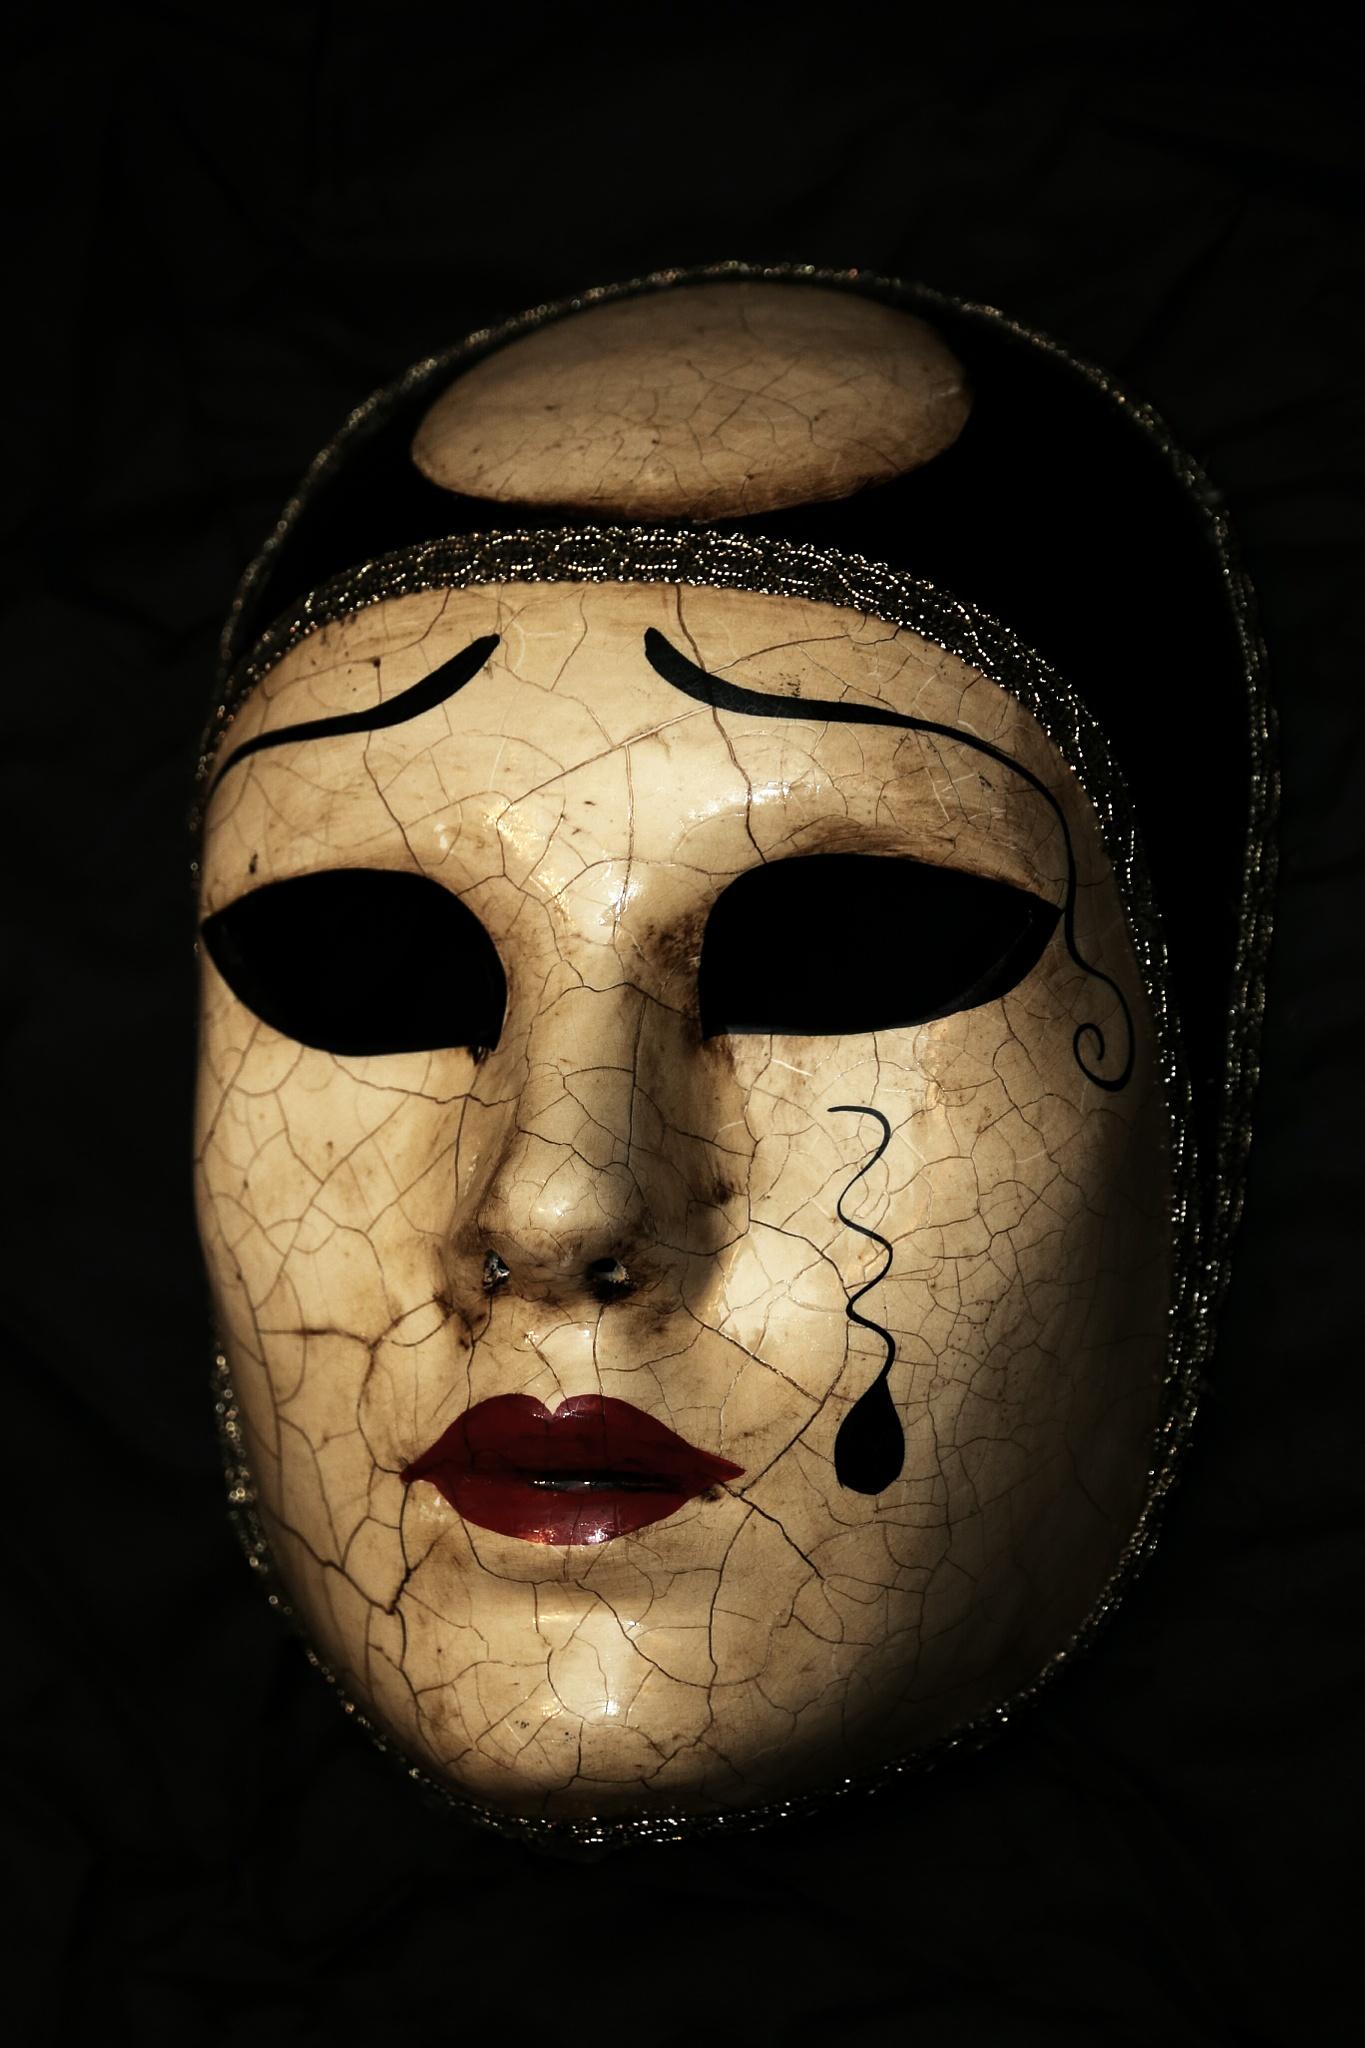 Venecian mask by Federico Molino